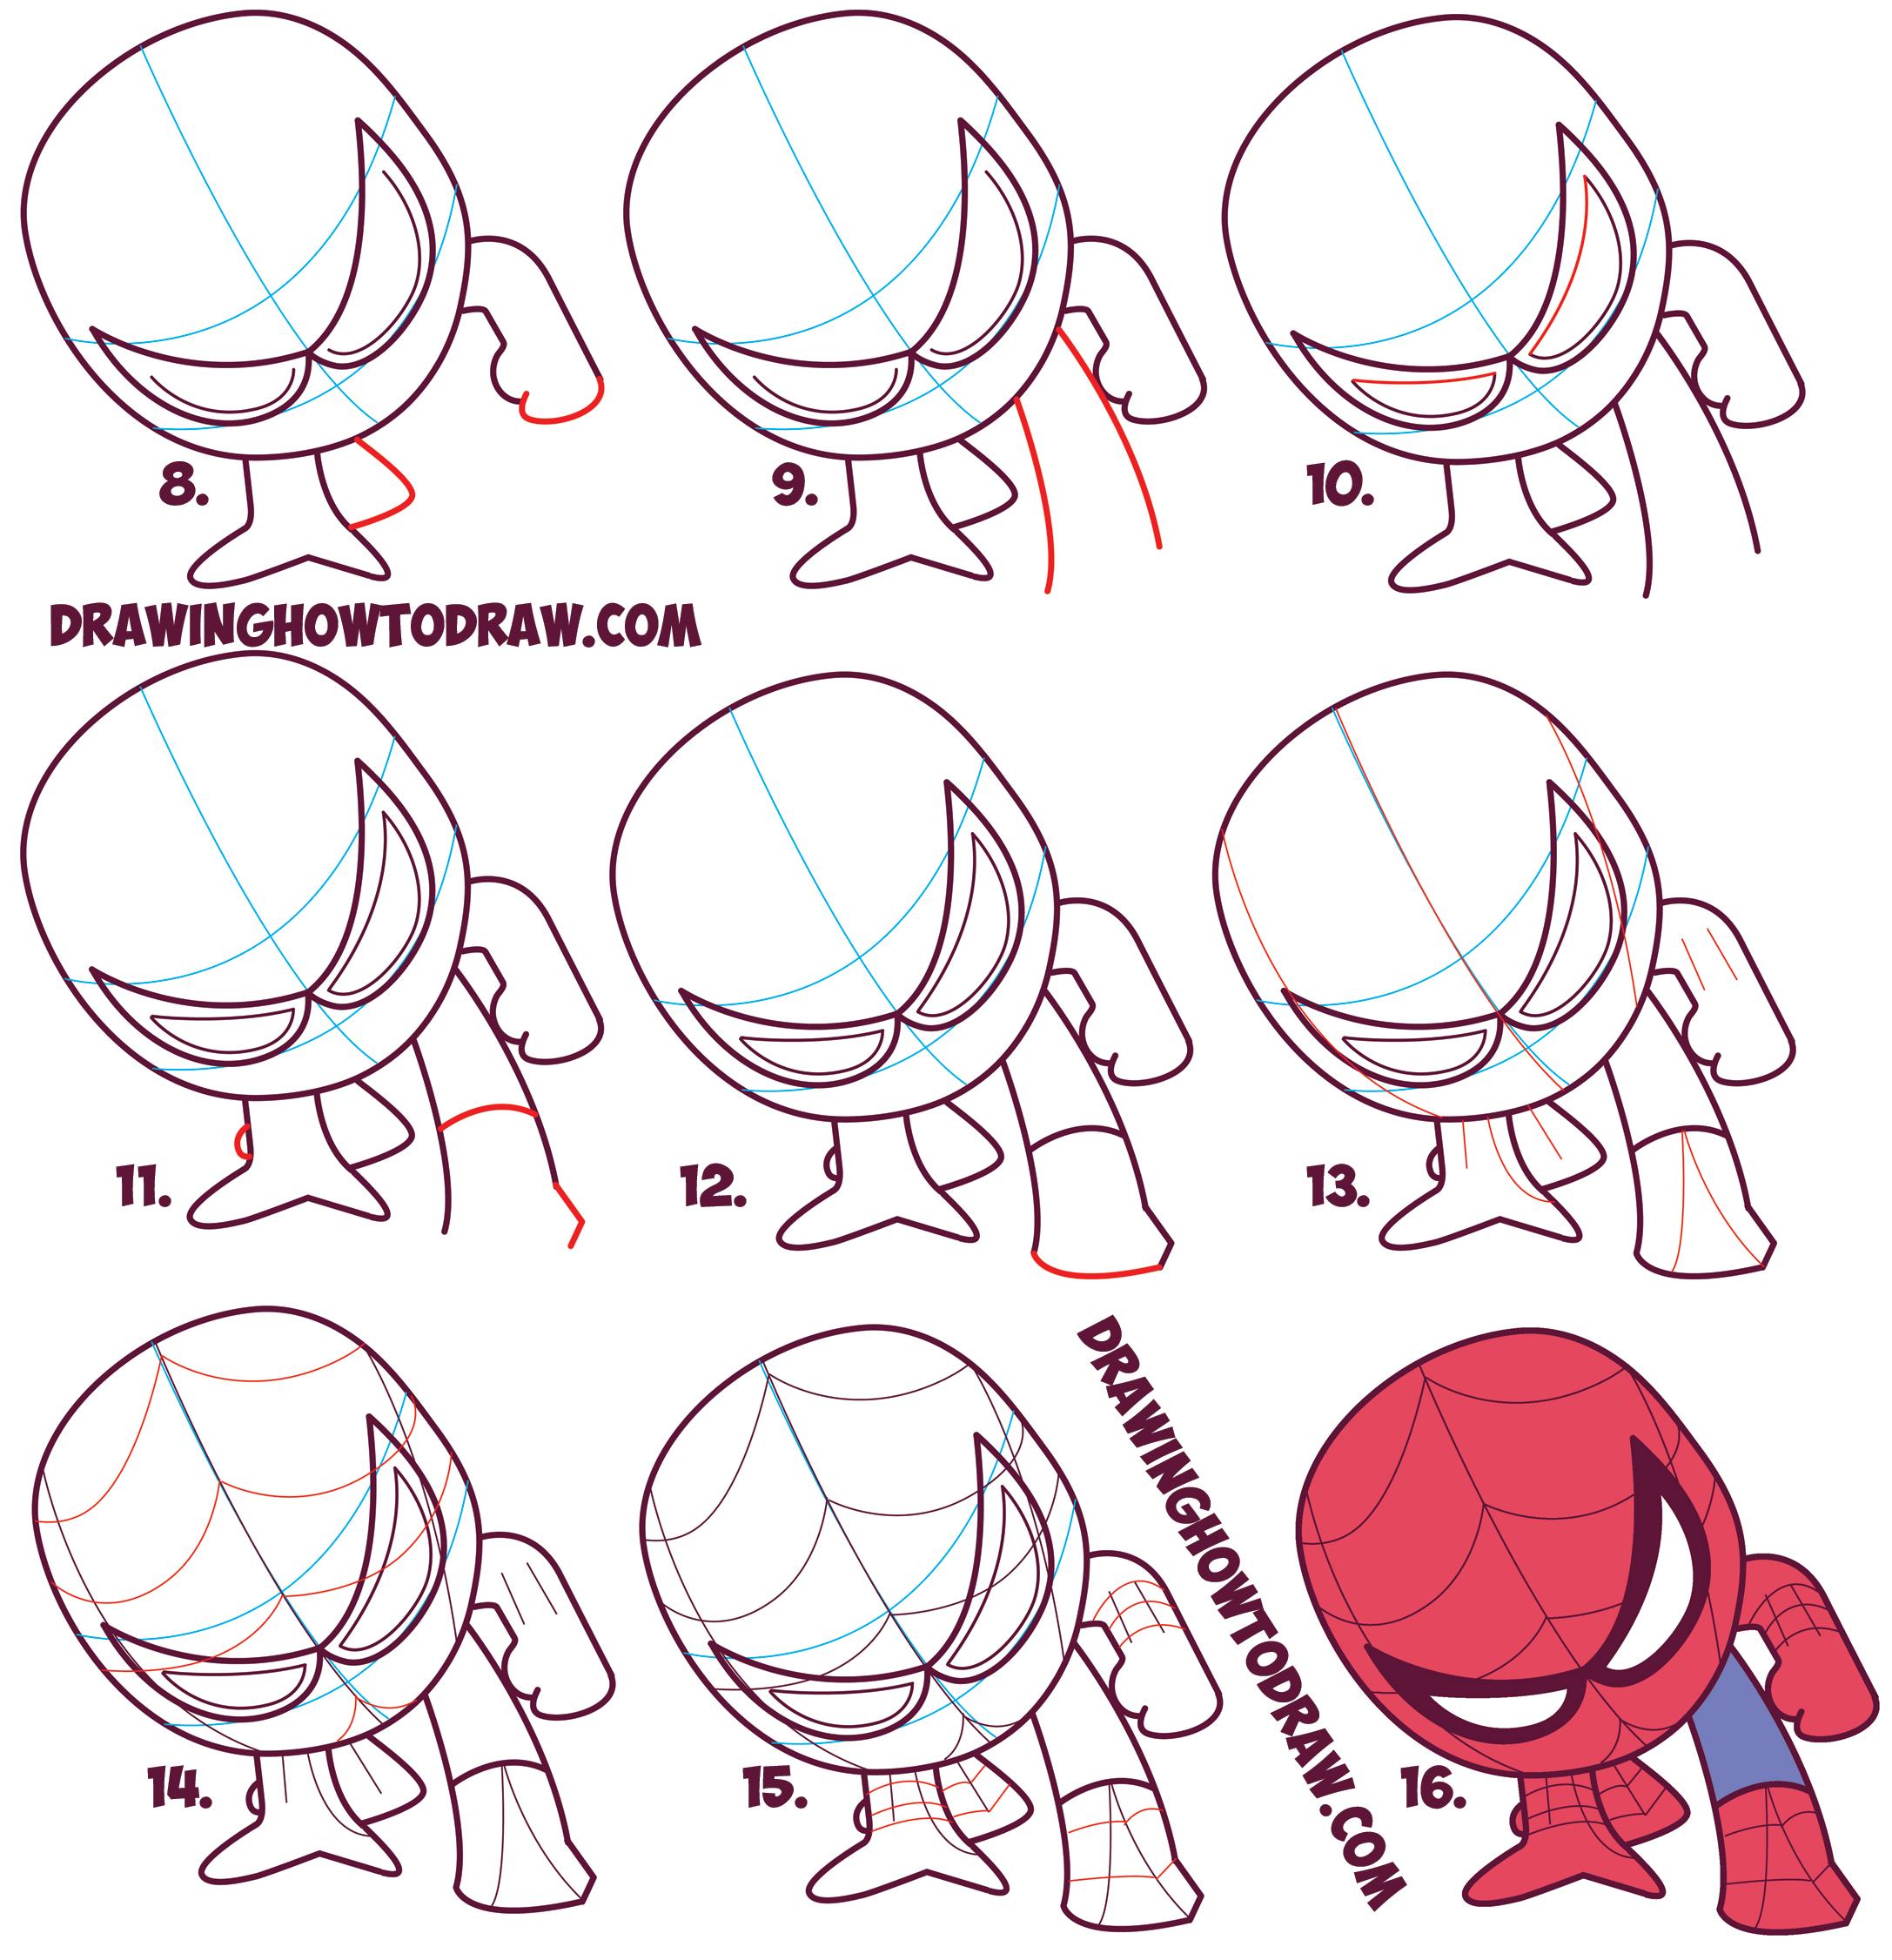 Drawn spiderman step by step (Chibi Spiderman Step Steps Easy